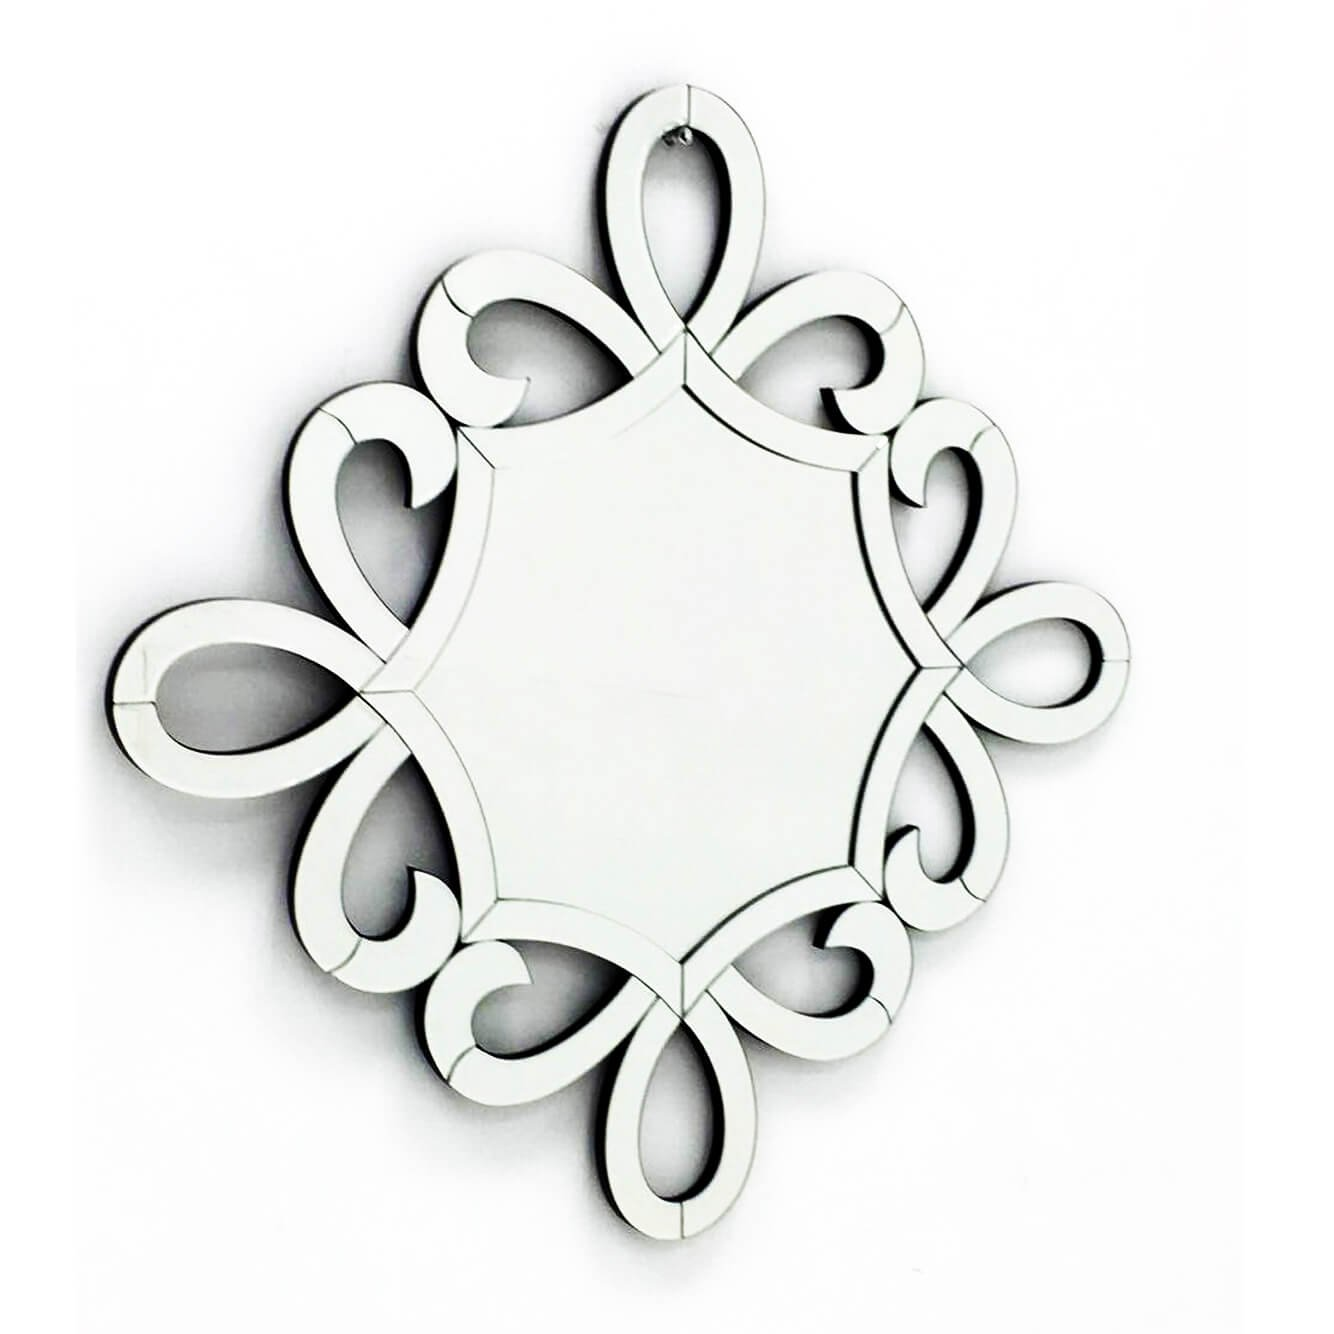 Fab Glass and Mirror FAB-WSTC007 Decorative Sunburst, Bathroom Wall Mirrors, 24 X 24 by Fab Glass and Mirror